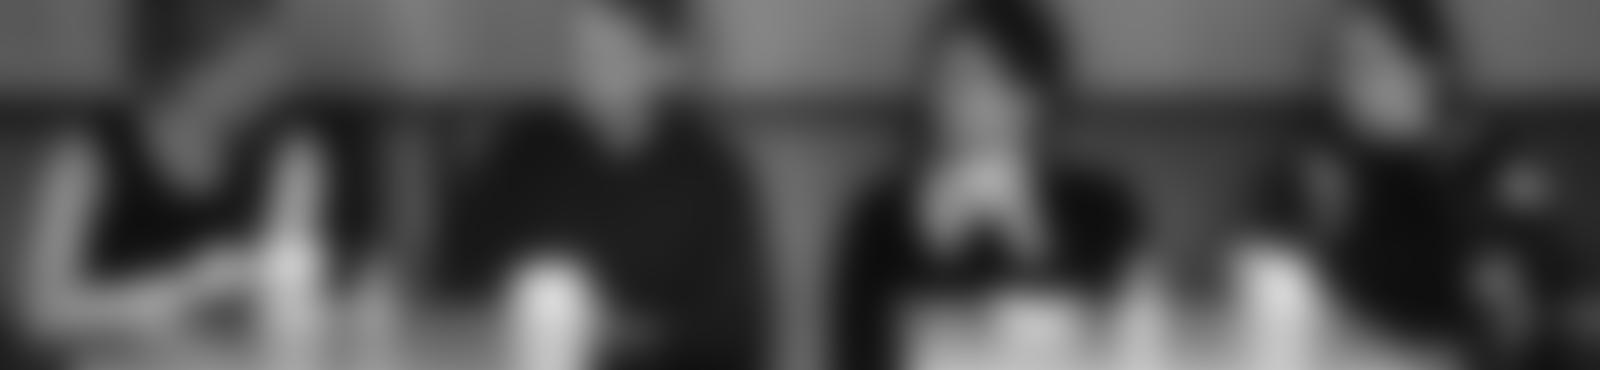 Blurred 2d44e70c dff6 40aa b550 ecea0d5a5508